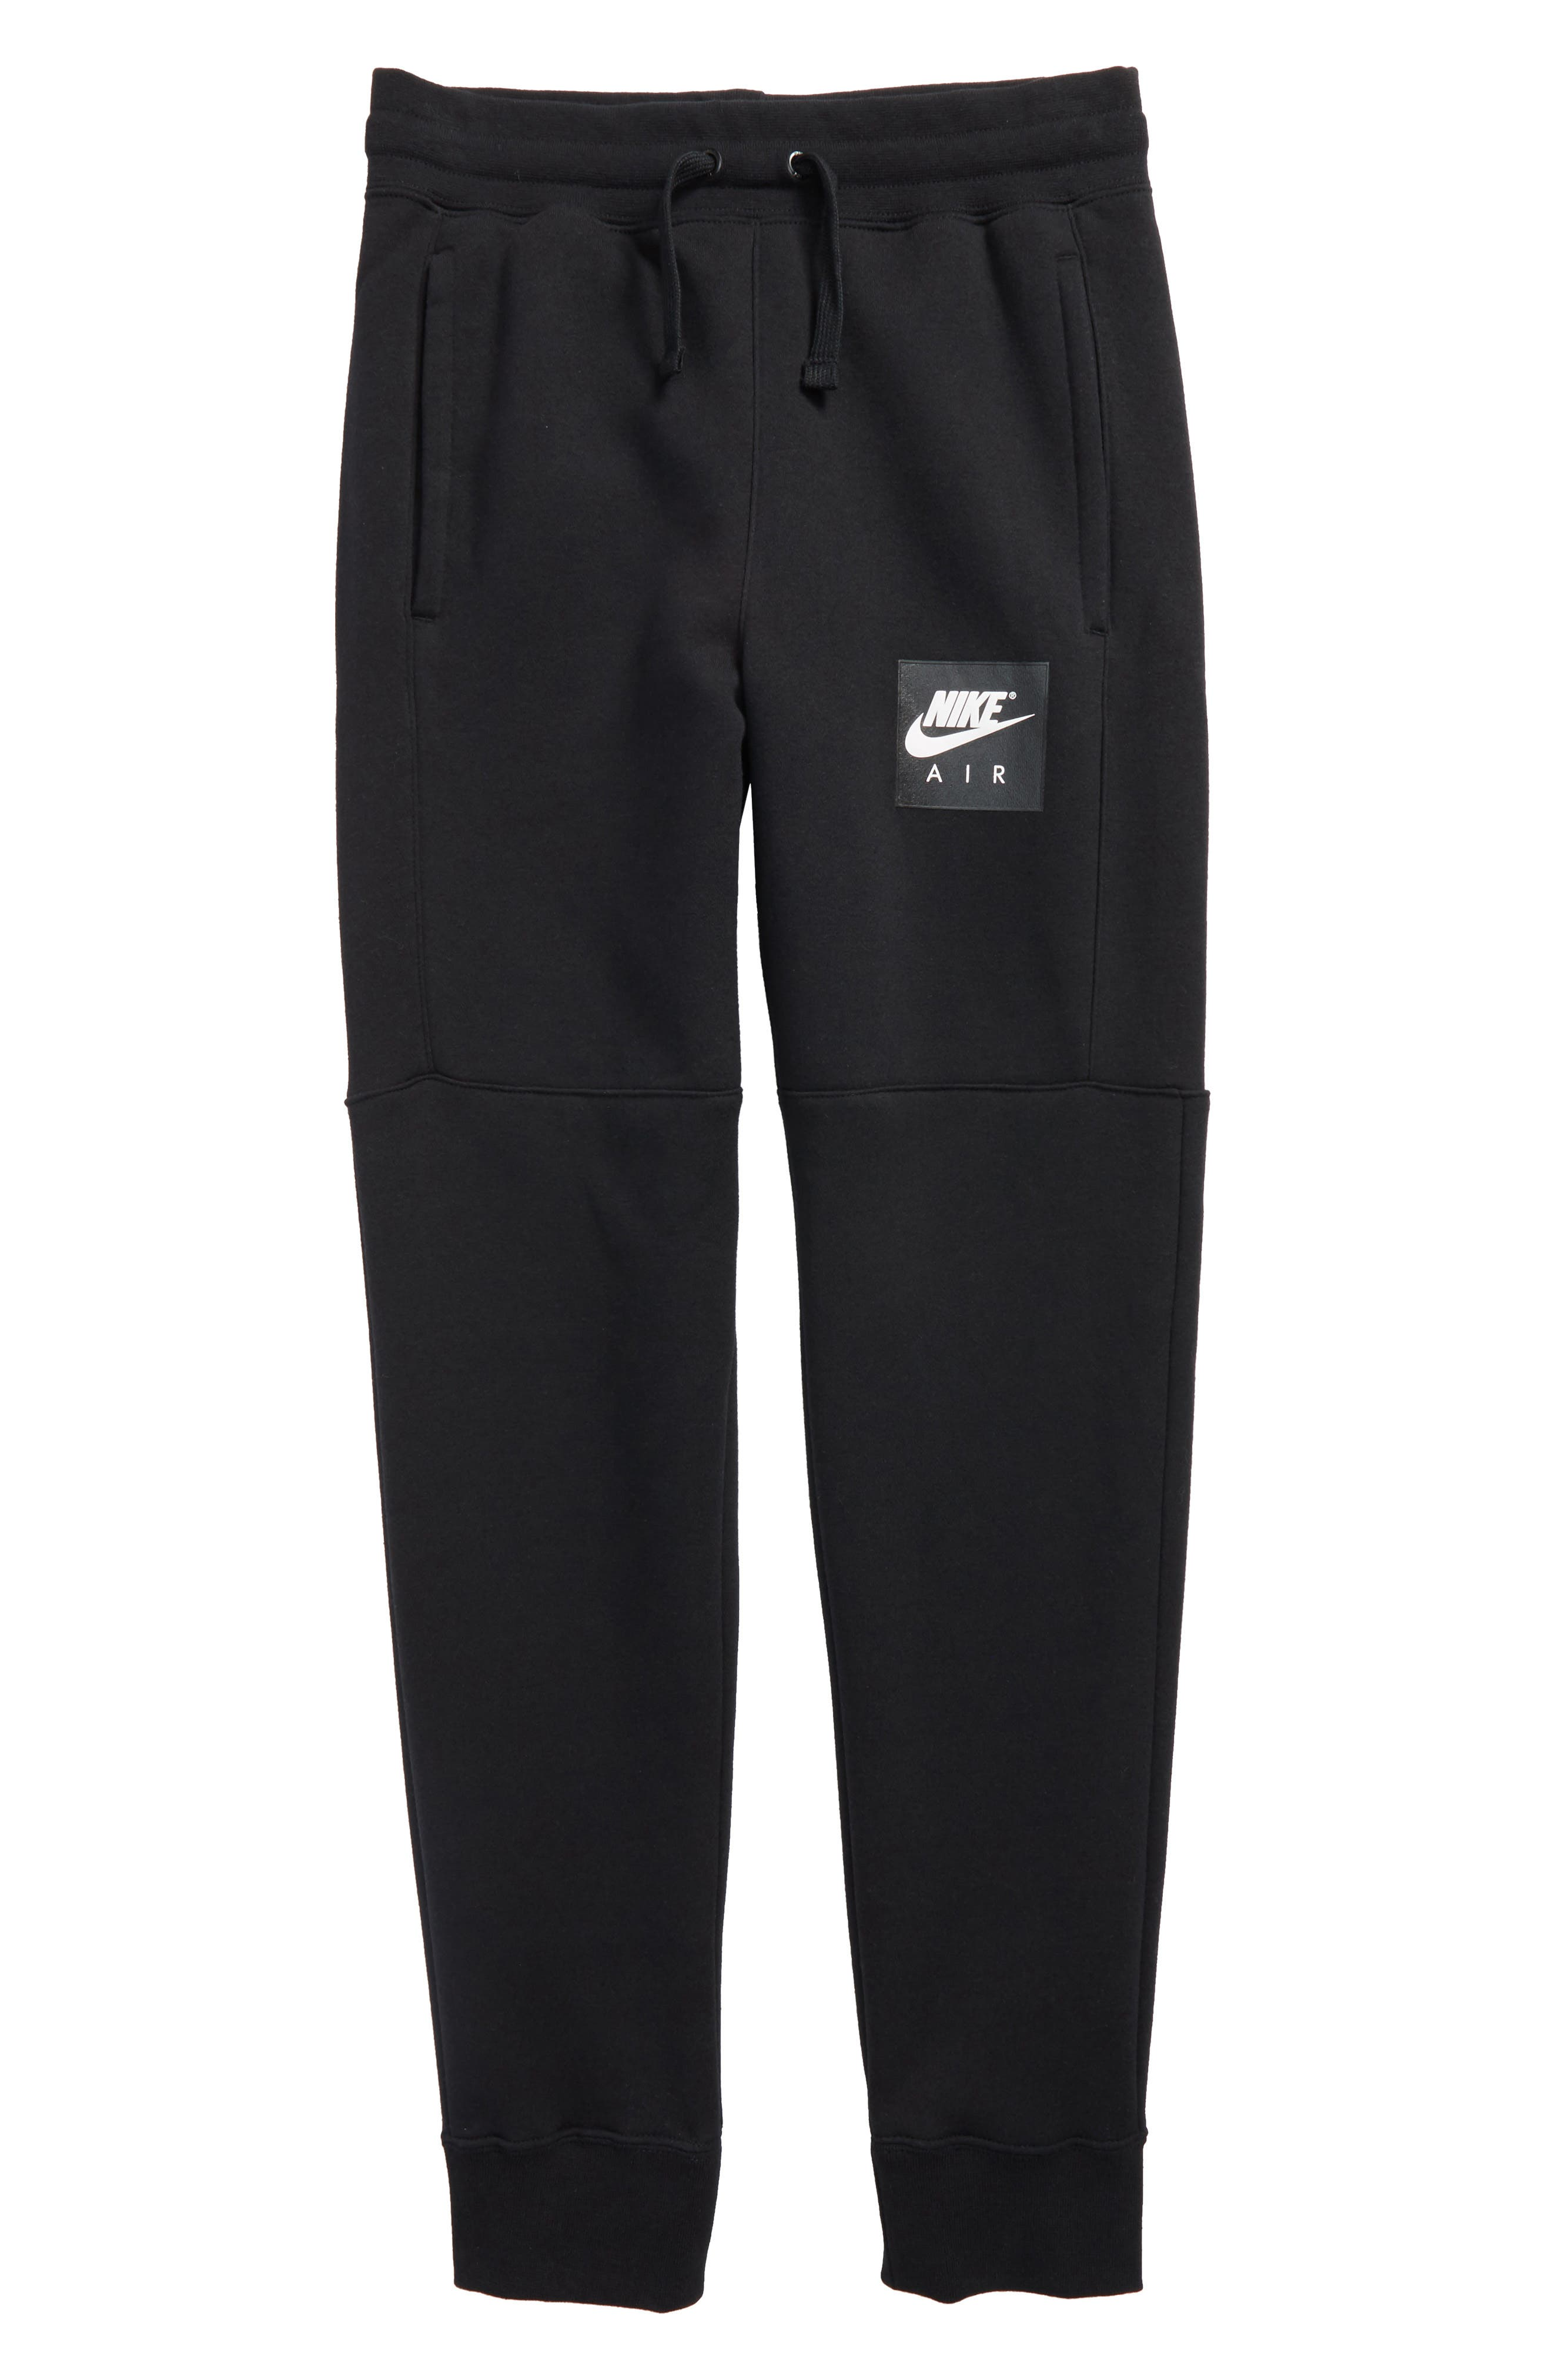 Air Sweatpants,                             Main thumbnail 1, color,                             Black/ White